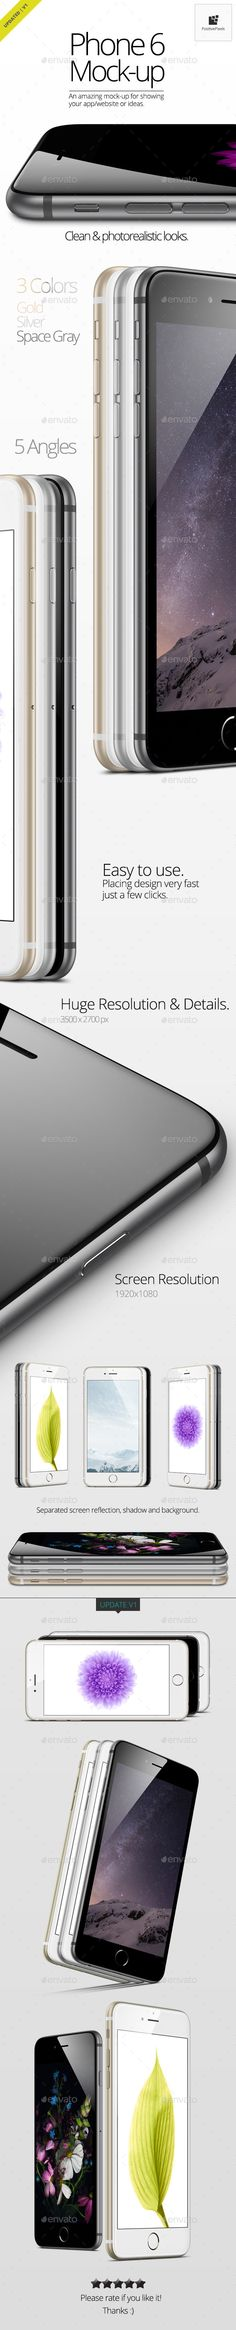 iPhone 6 Mock-Up | #iphone6mockup #iphonemockup #mockups | Download: http://graphicriver.net/item/phone-6-mockup/8998141?ref=ksioks